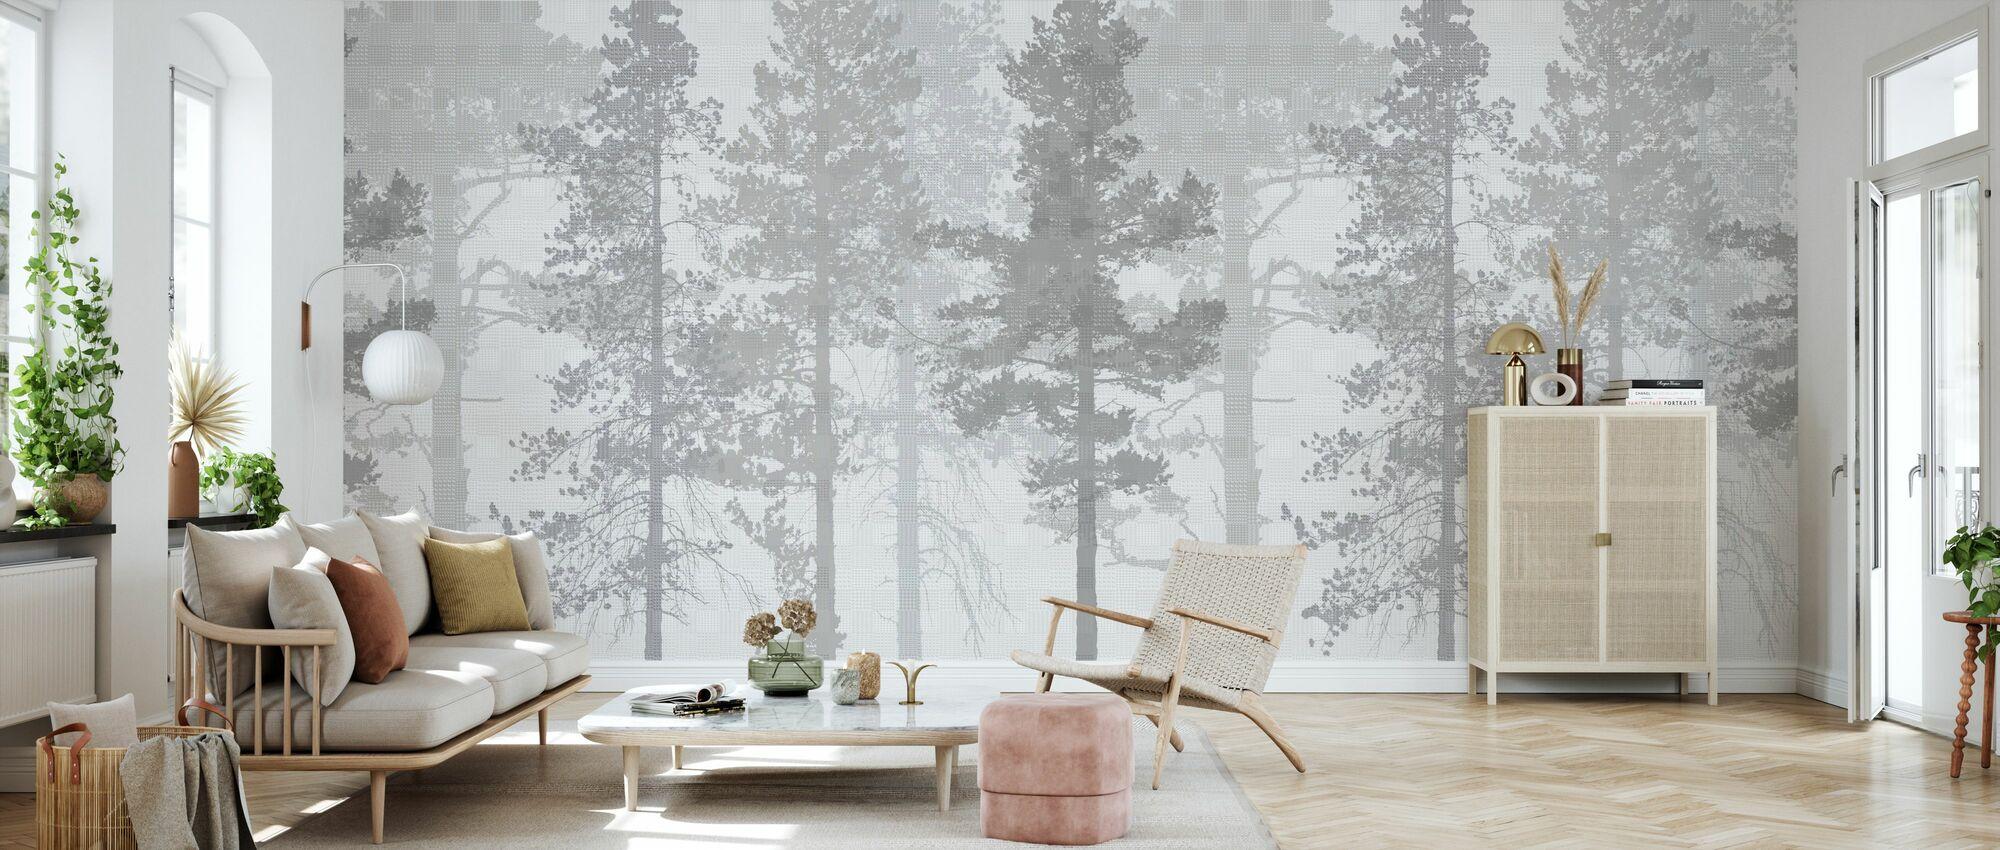 Weaving Wood Grey - Wallpaper - Living Room